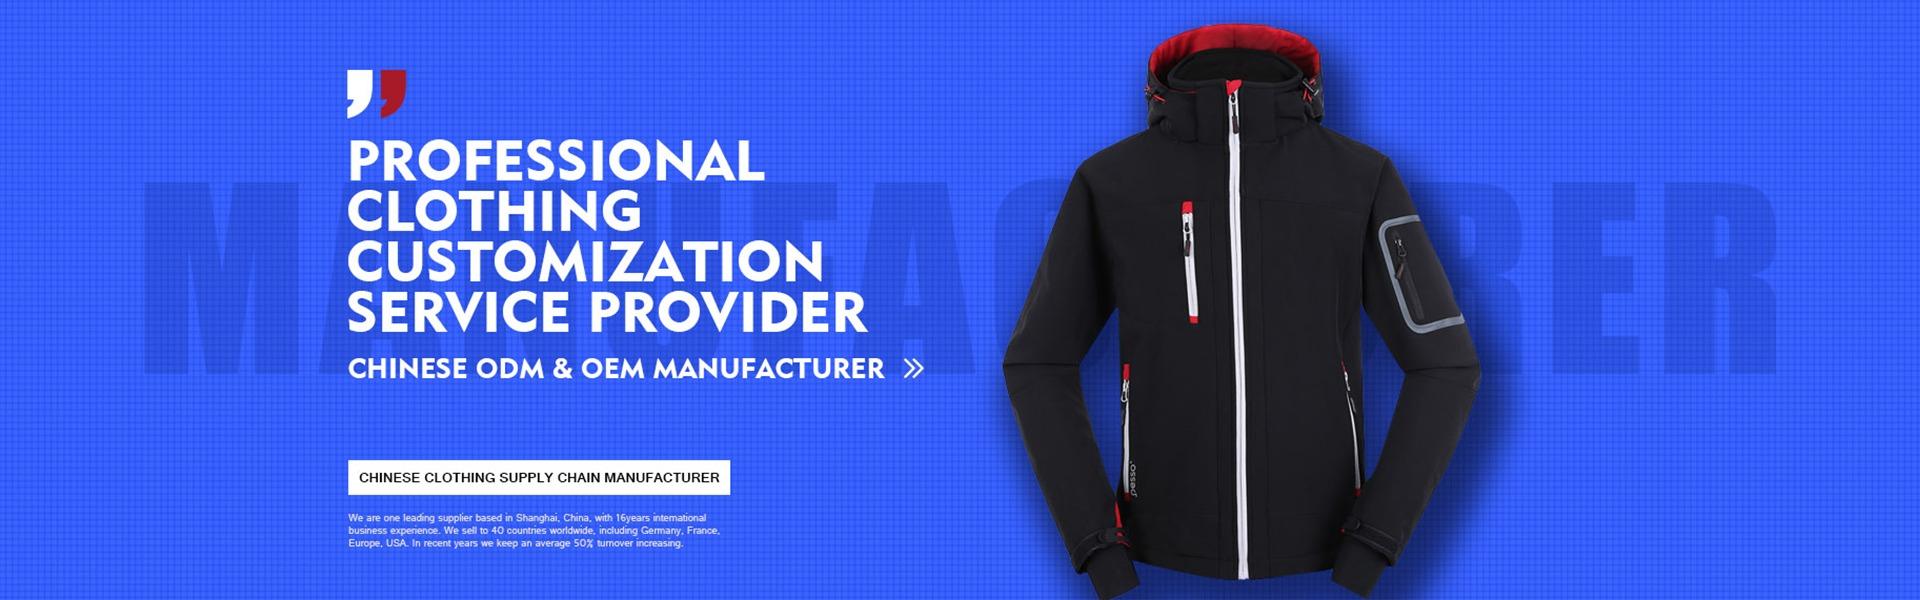 Personnalisé Polaire Veste Outdoor Work Custom Imprimé Workwear Broderie Logo